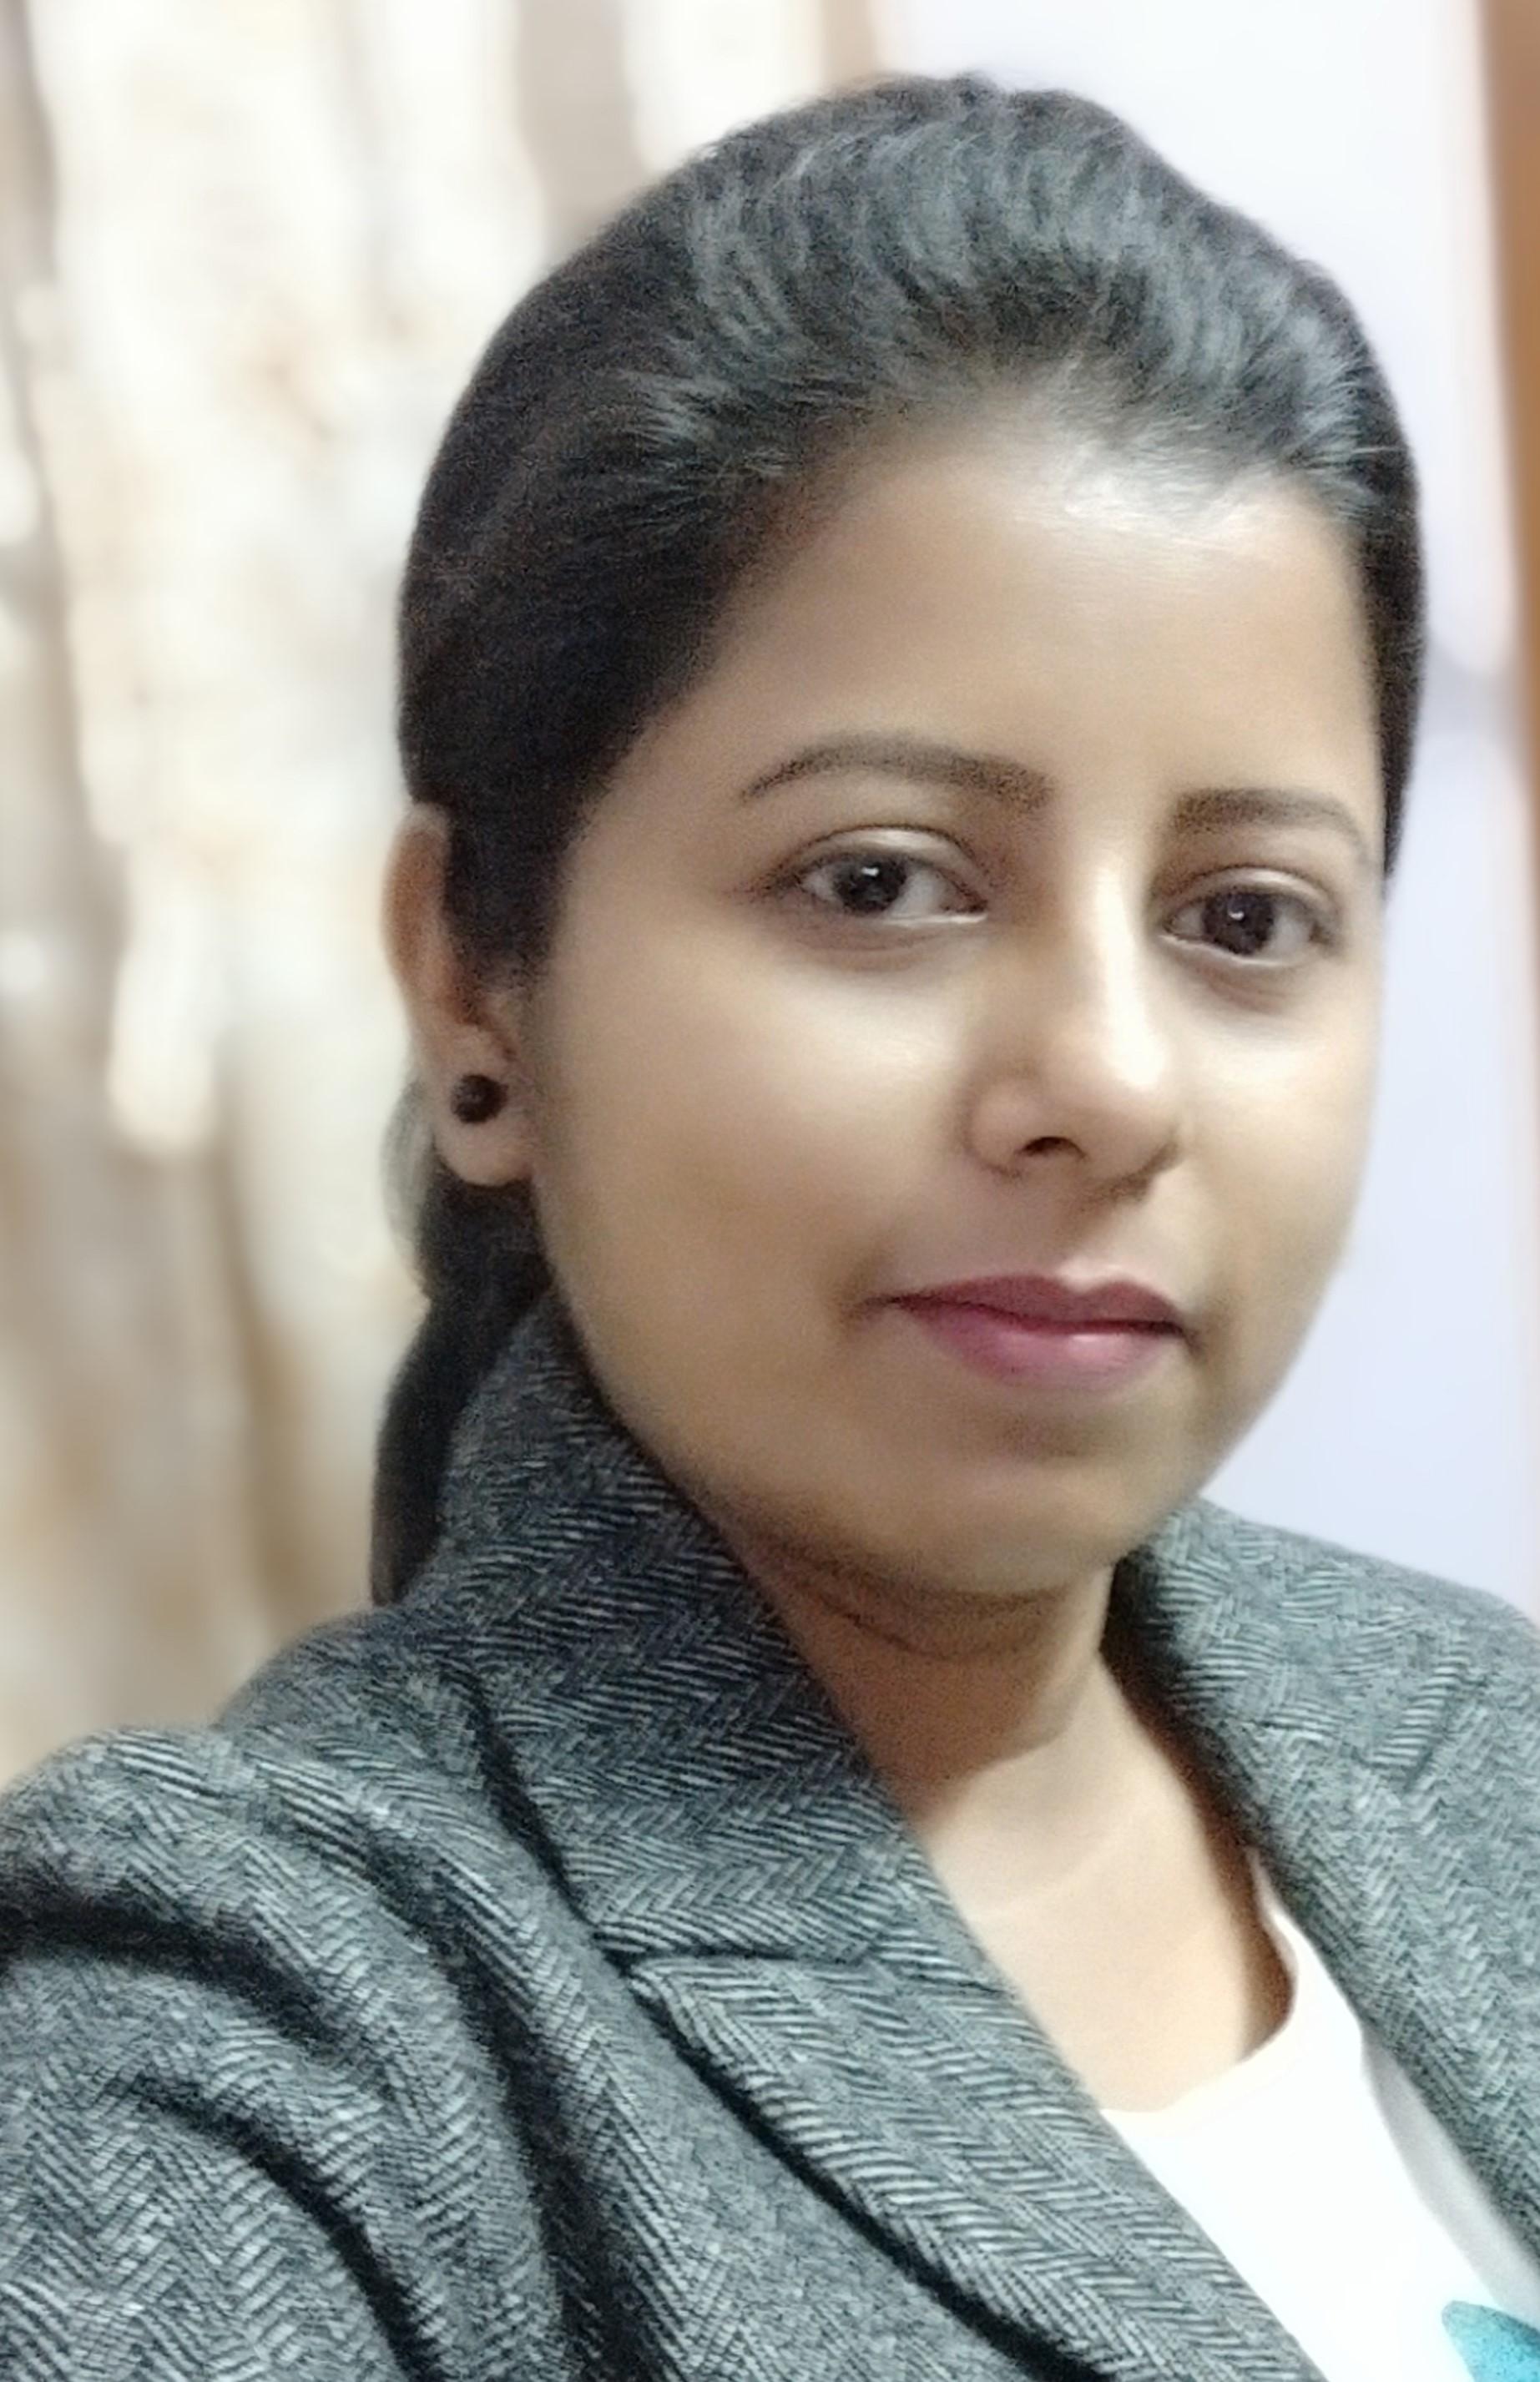 Dr. Arpita Sarkar